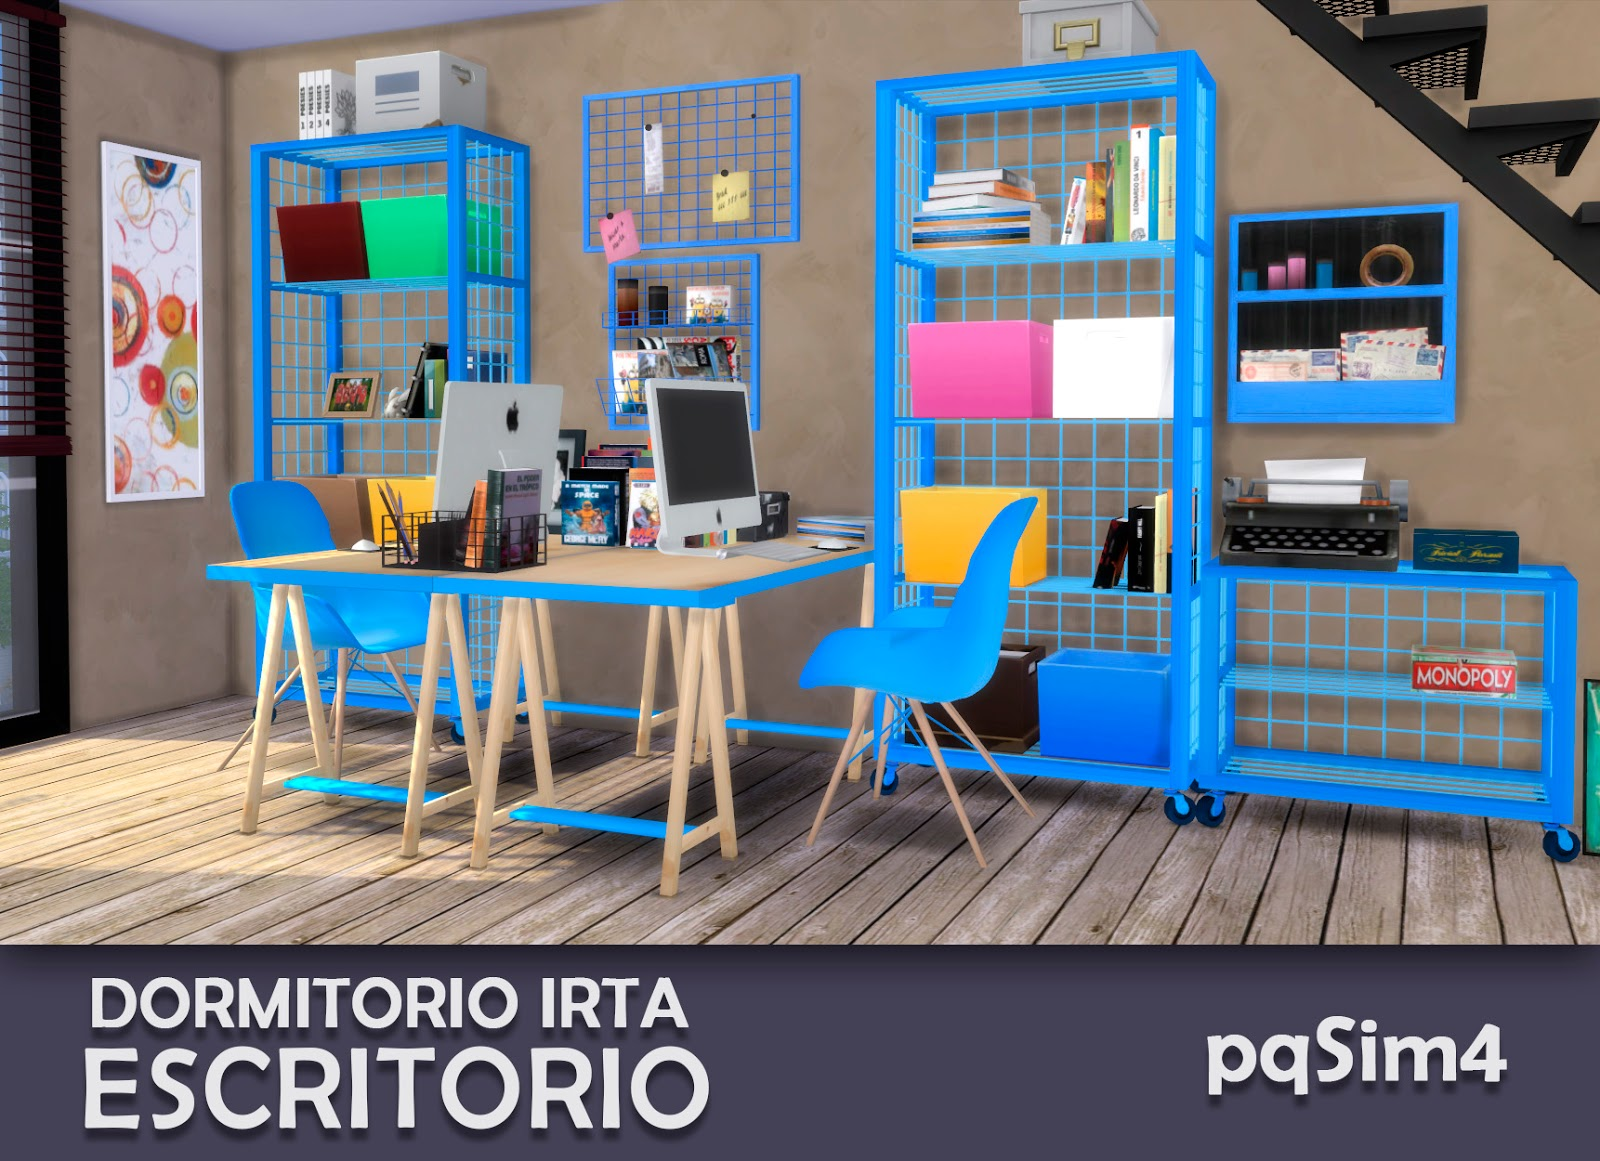 Dormitorio irta set 2 escritorio sims 4 custom content for Dormitorio sims 4